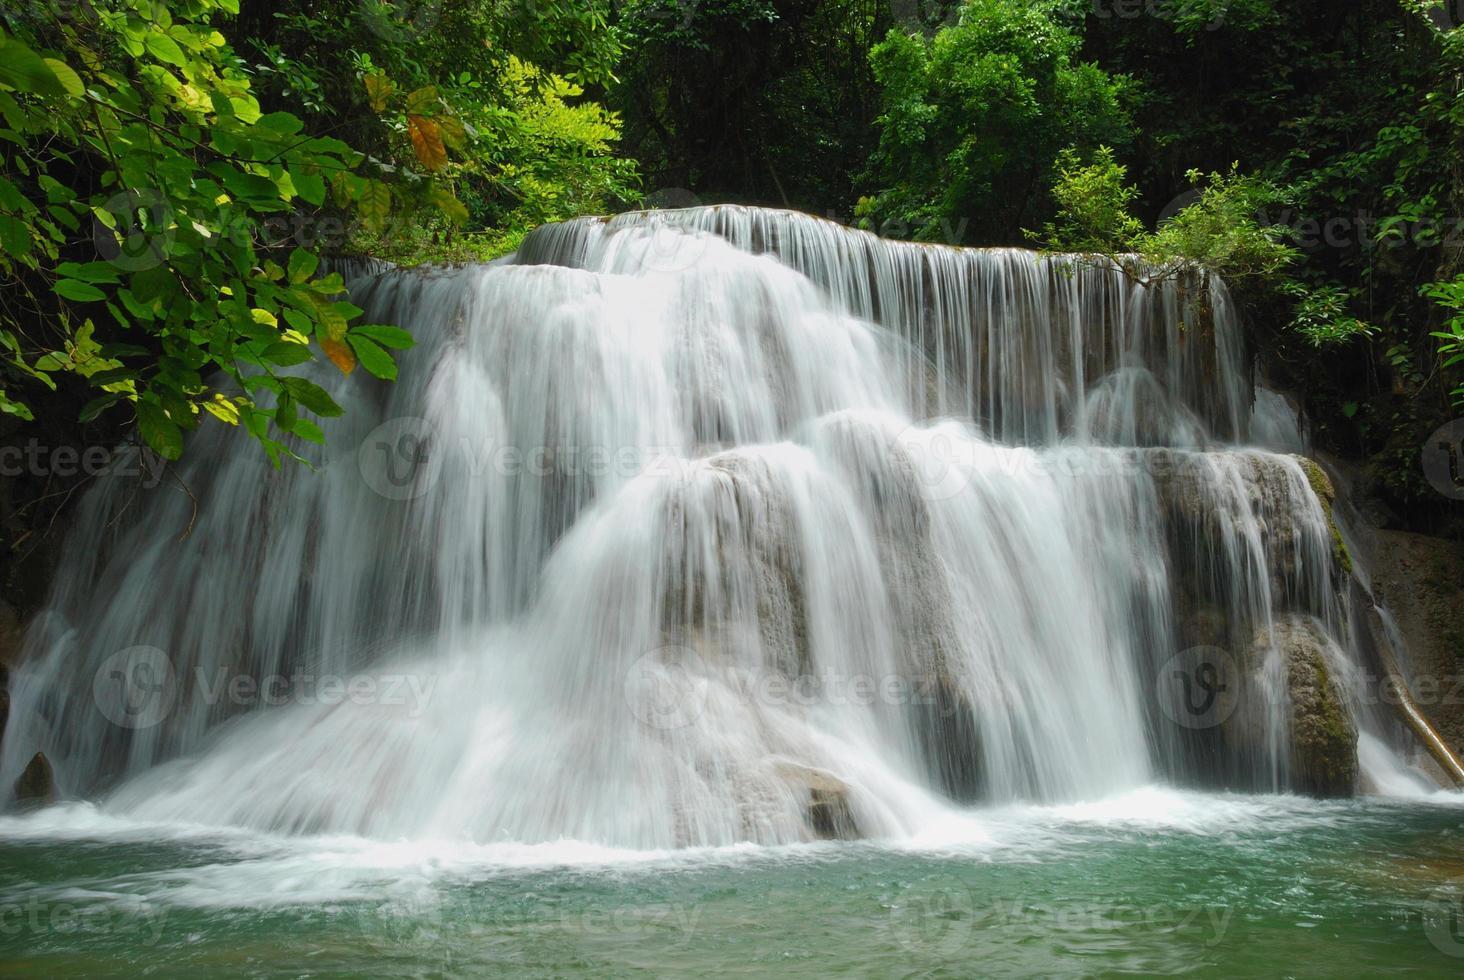 huay mae ka min vattenfall i Thailand foto